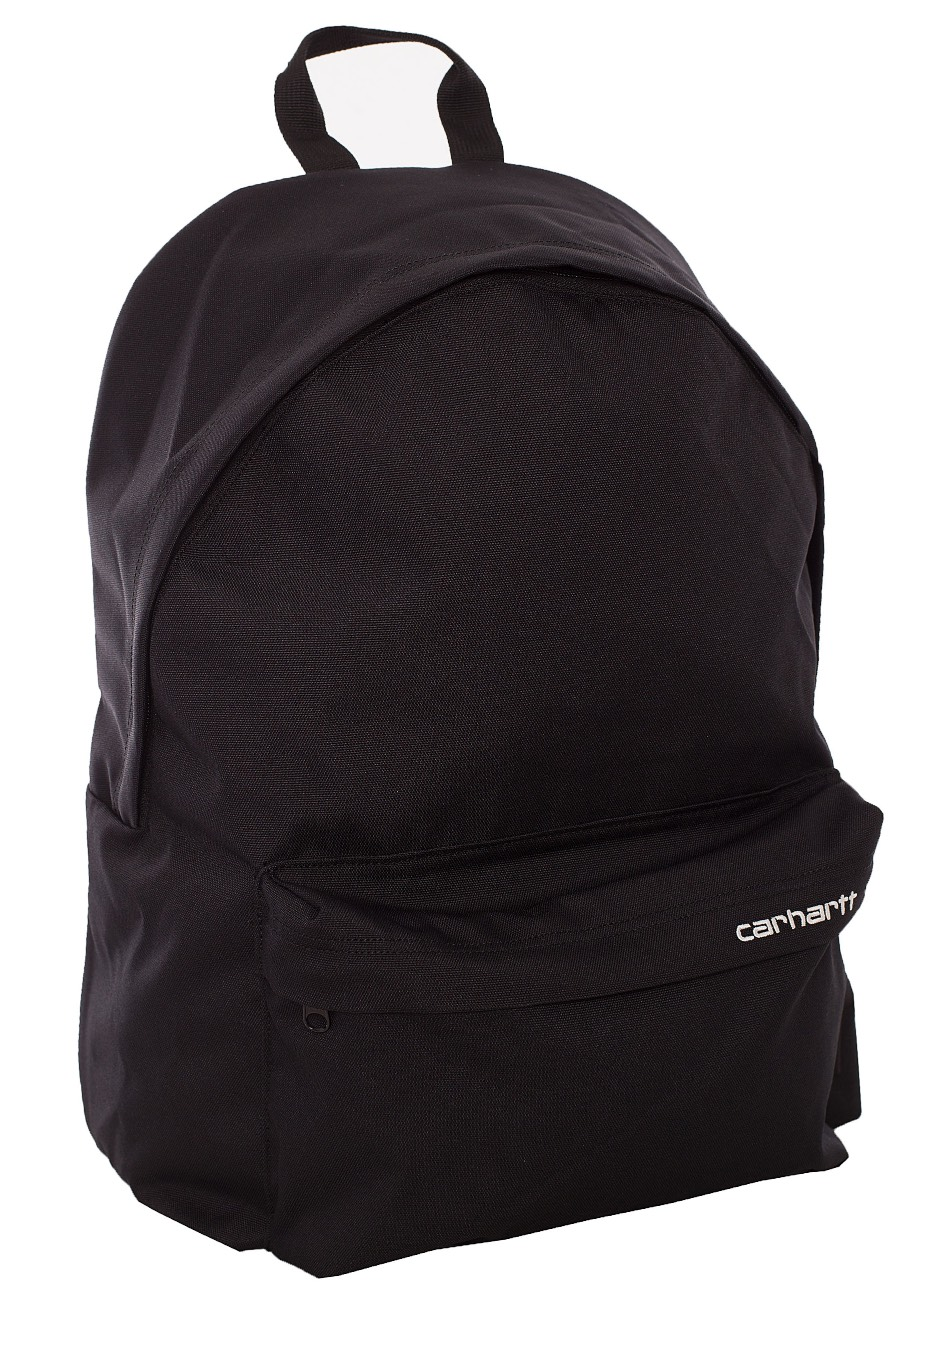 Carhartt WIP - Payton Black White - Backpack - Streetwear Shop -  Impericon.com UK